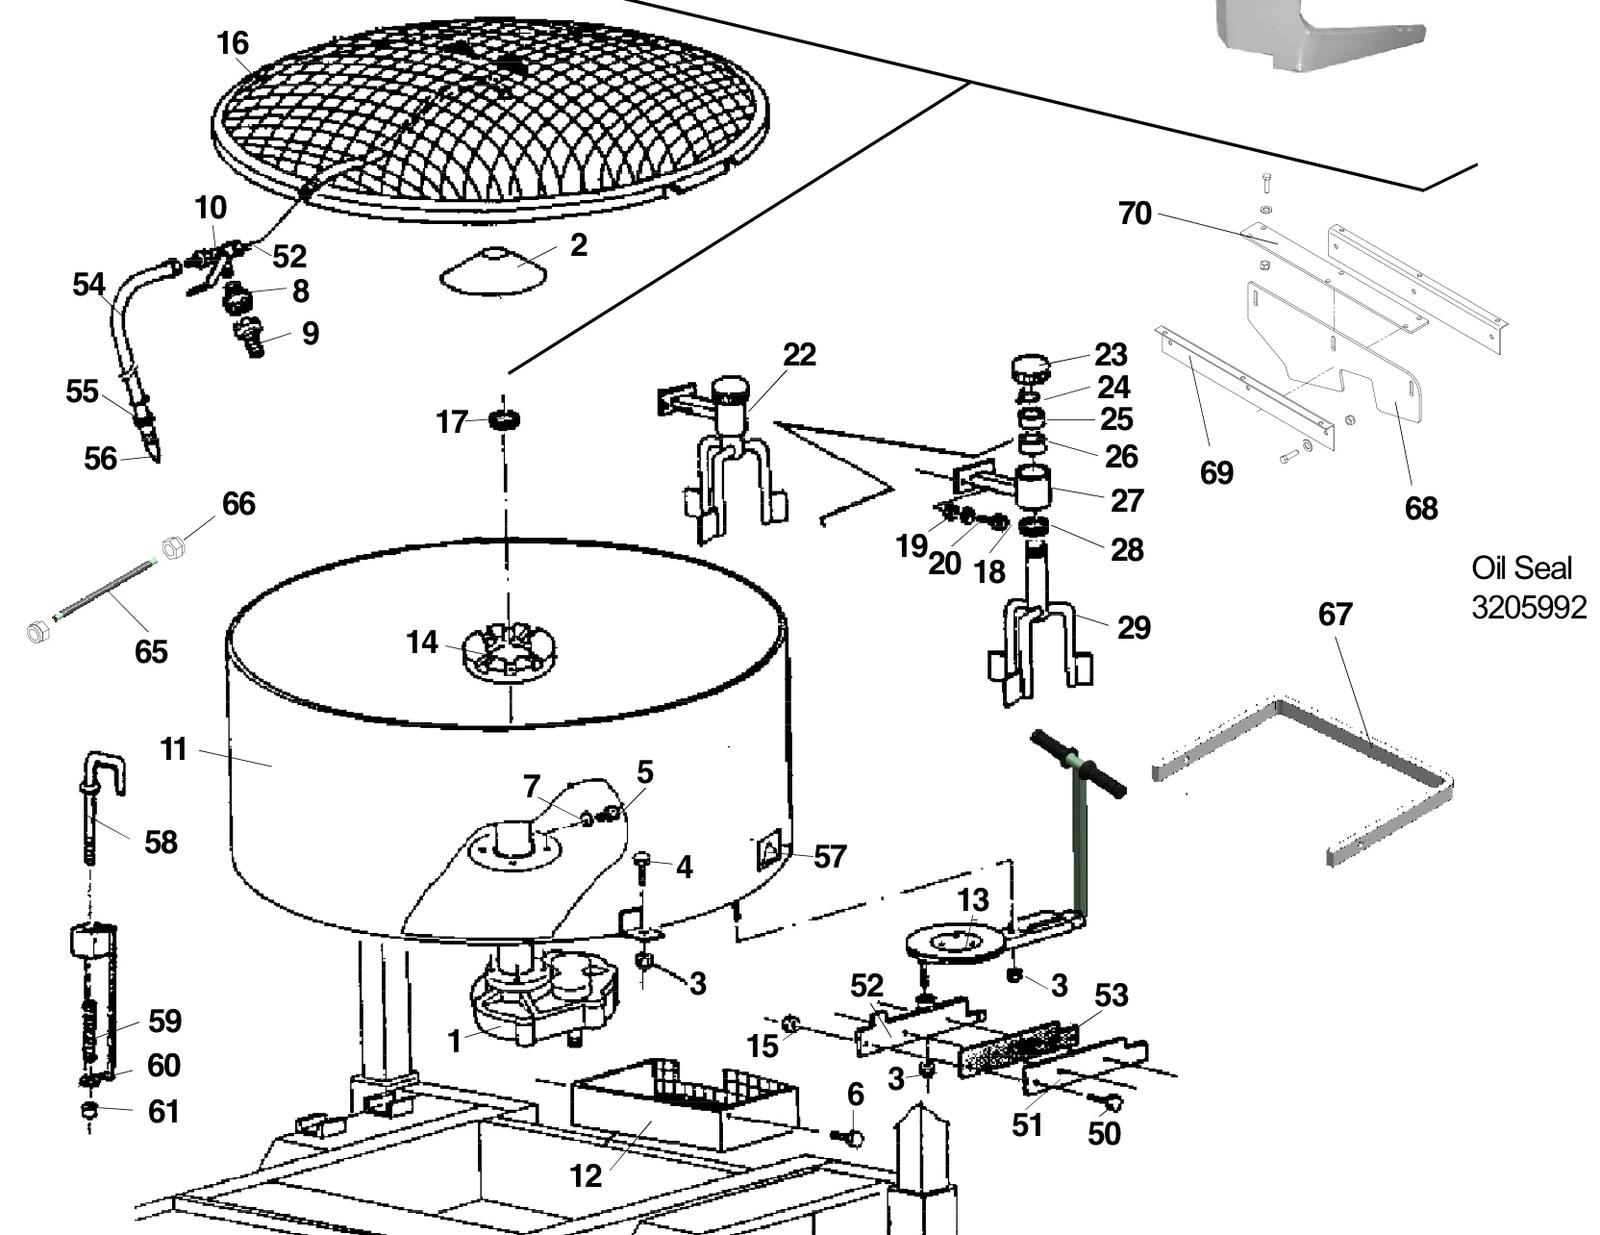 mortarman 750 mixer ball valve pn 2218068 10 in schematic drawing [ 1600 x 1235 Pixel ]